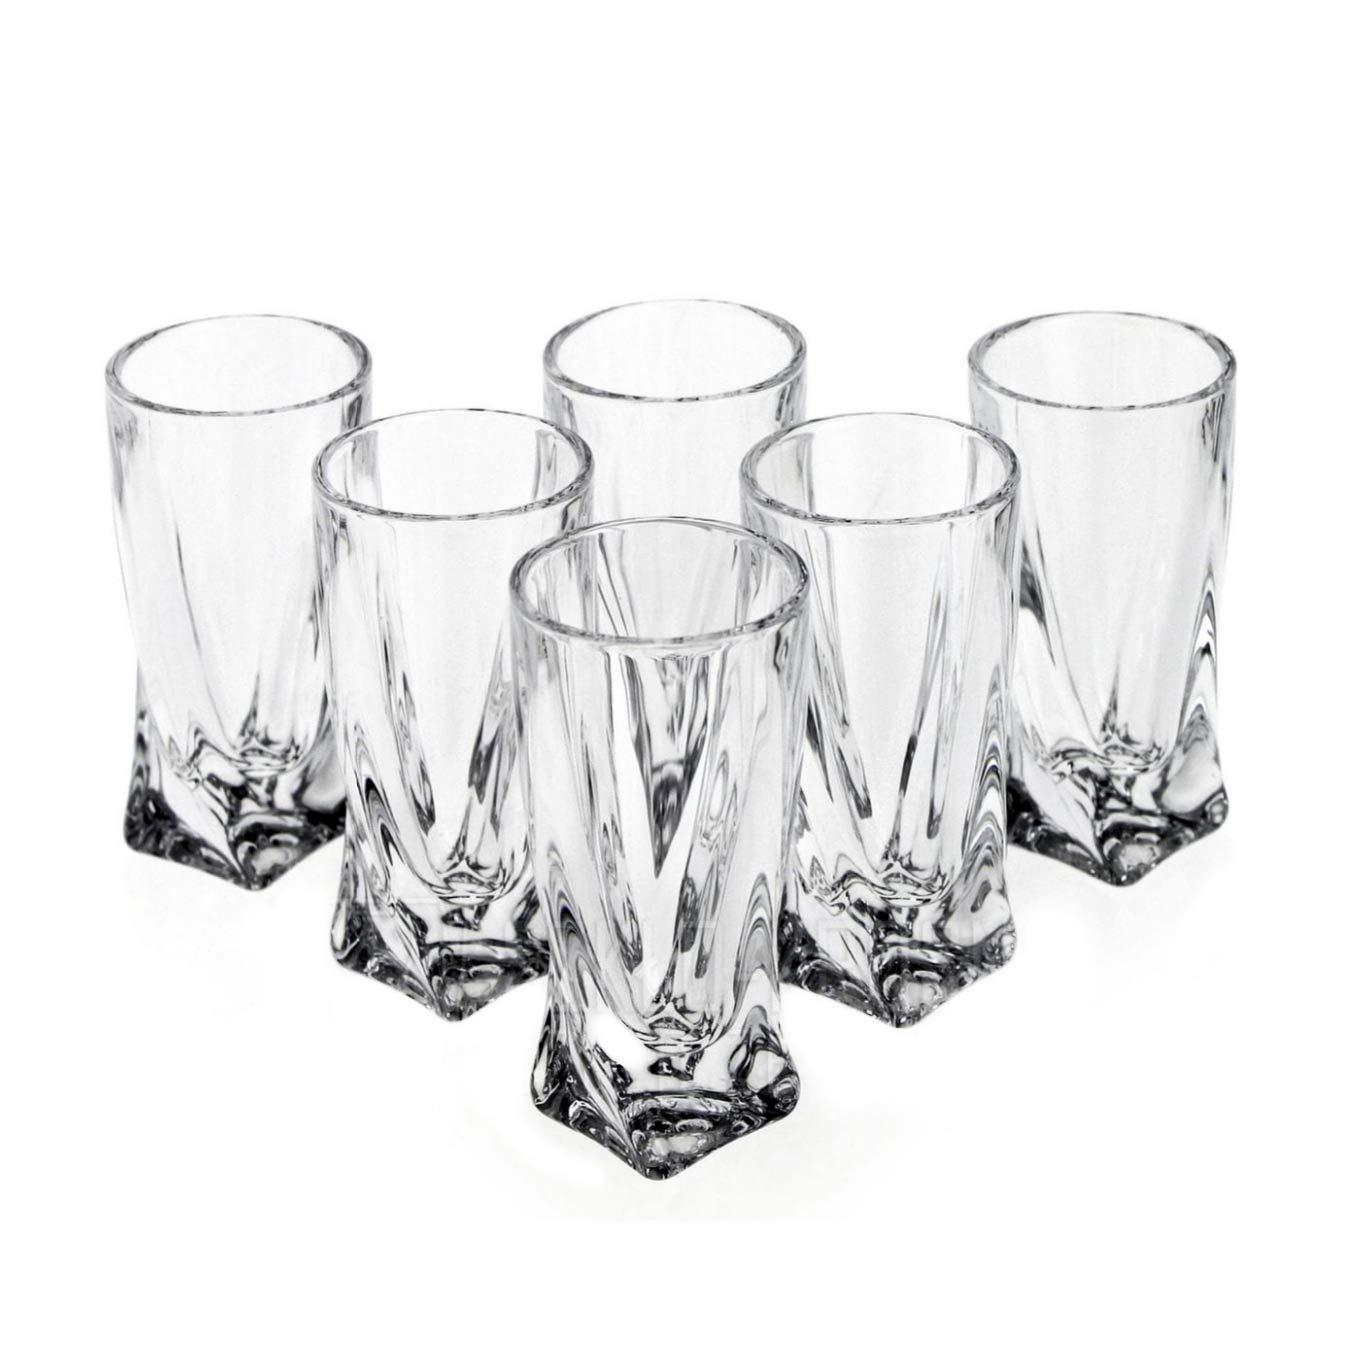 Lead-free Twisted Shape Shot Glasses, Set of 6 | 1.7 oz